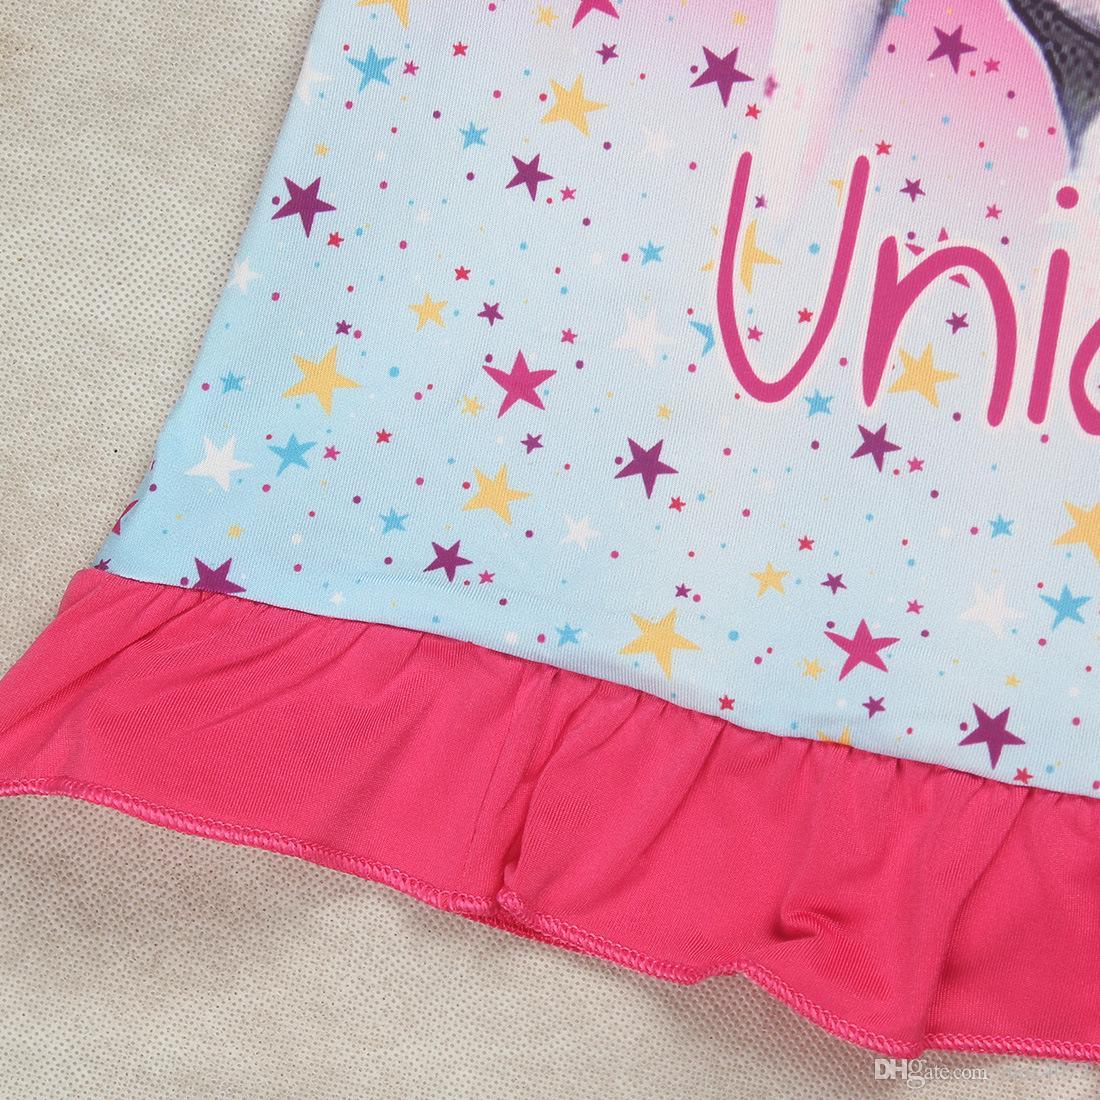 unicorn little girl dress cartoon anime horse cotton dresses for 4-10years girls kids children Summer outerwear clothes